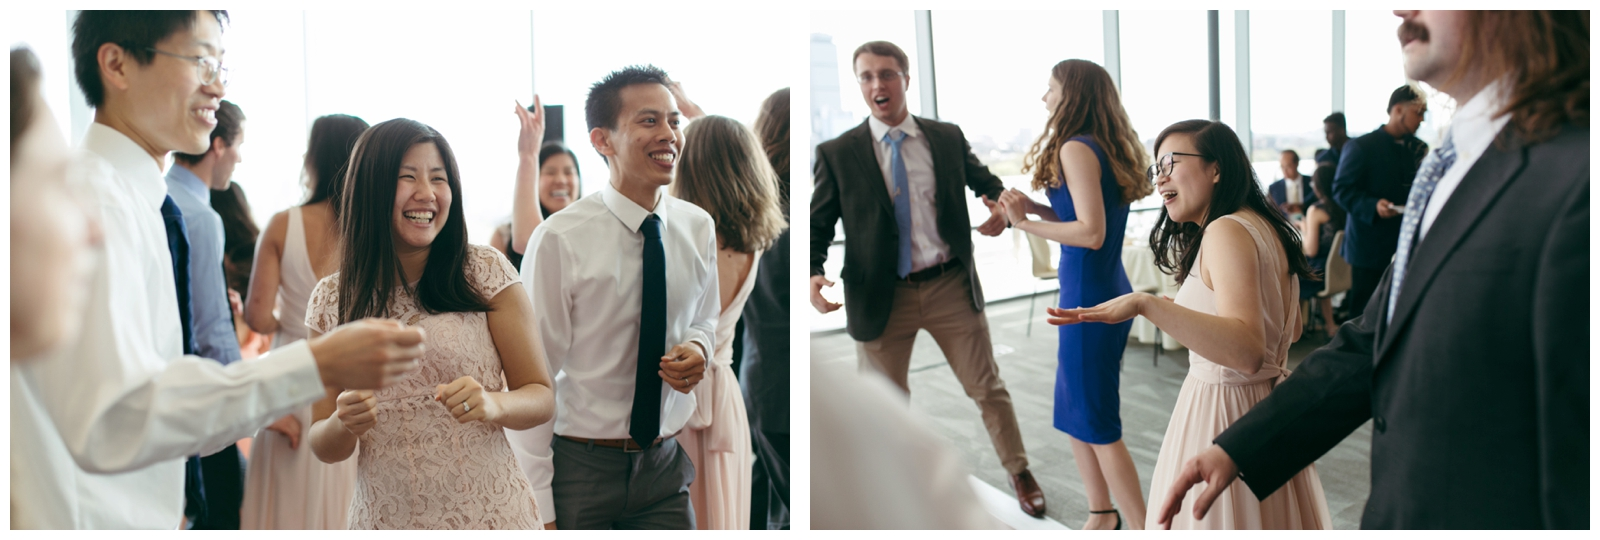 Samberg-Conference-Center-Boston-Wedding-Photographer-Bailey-Q-Photo-125.jpg